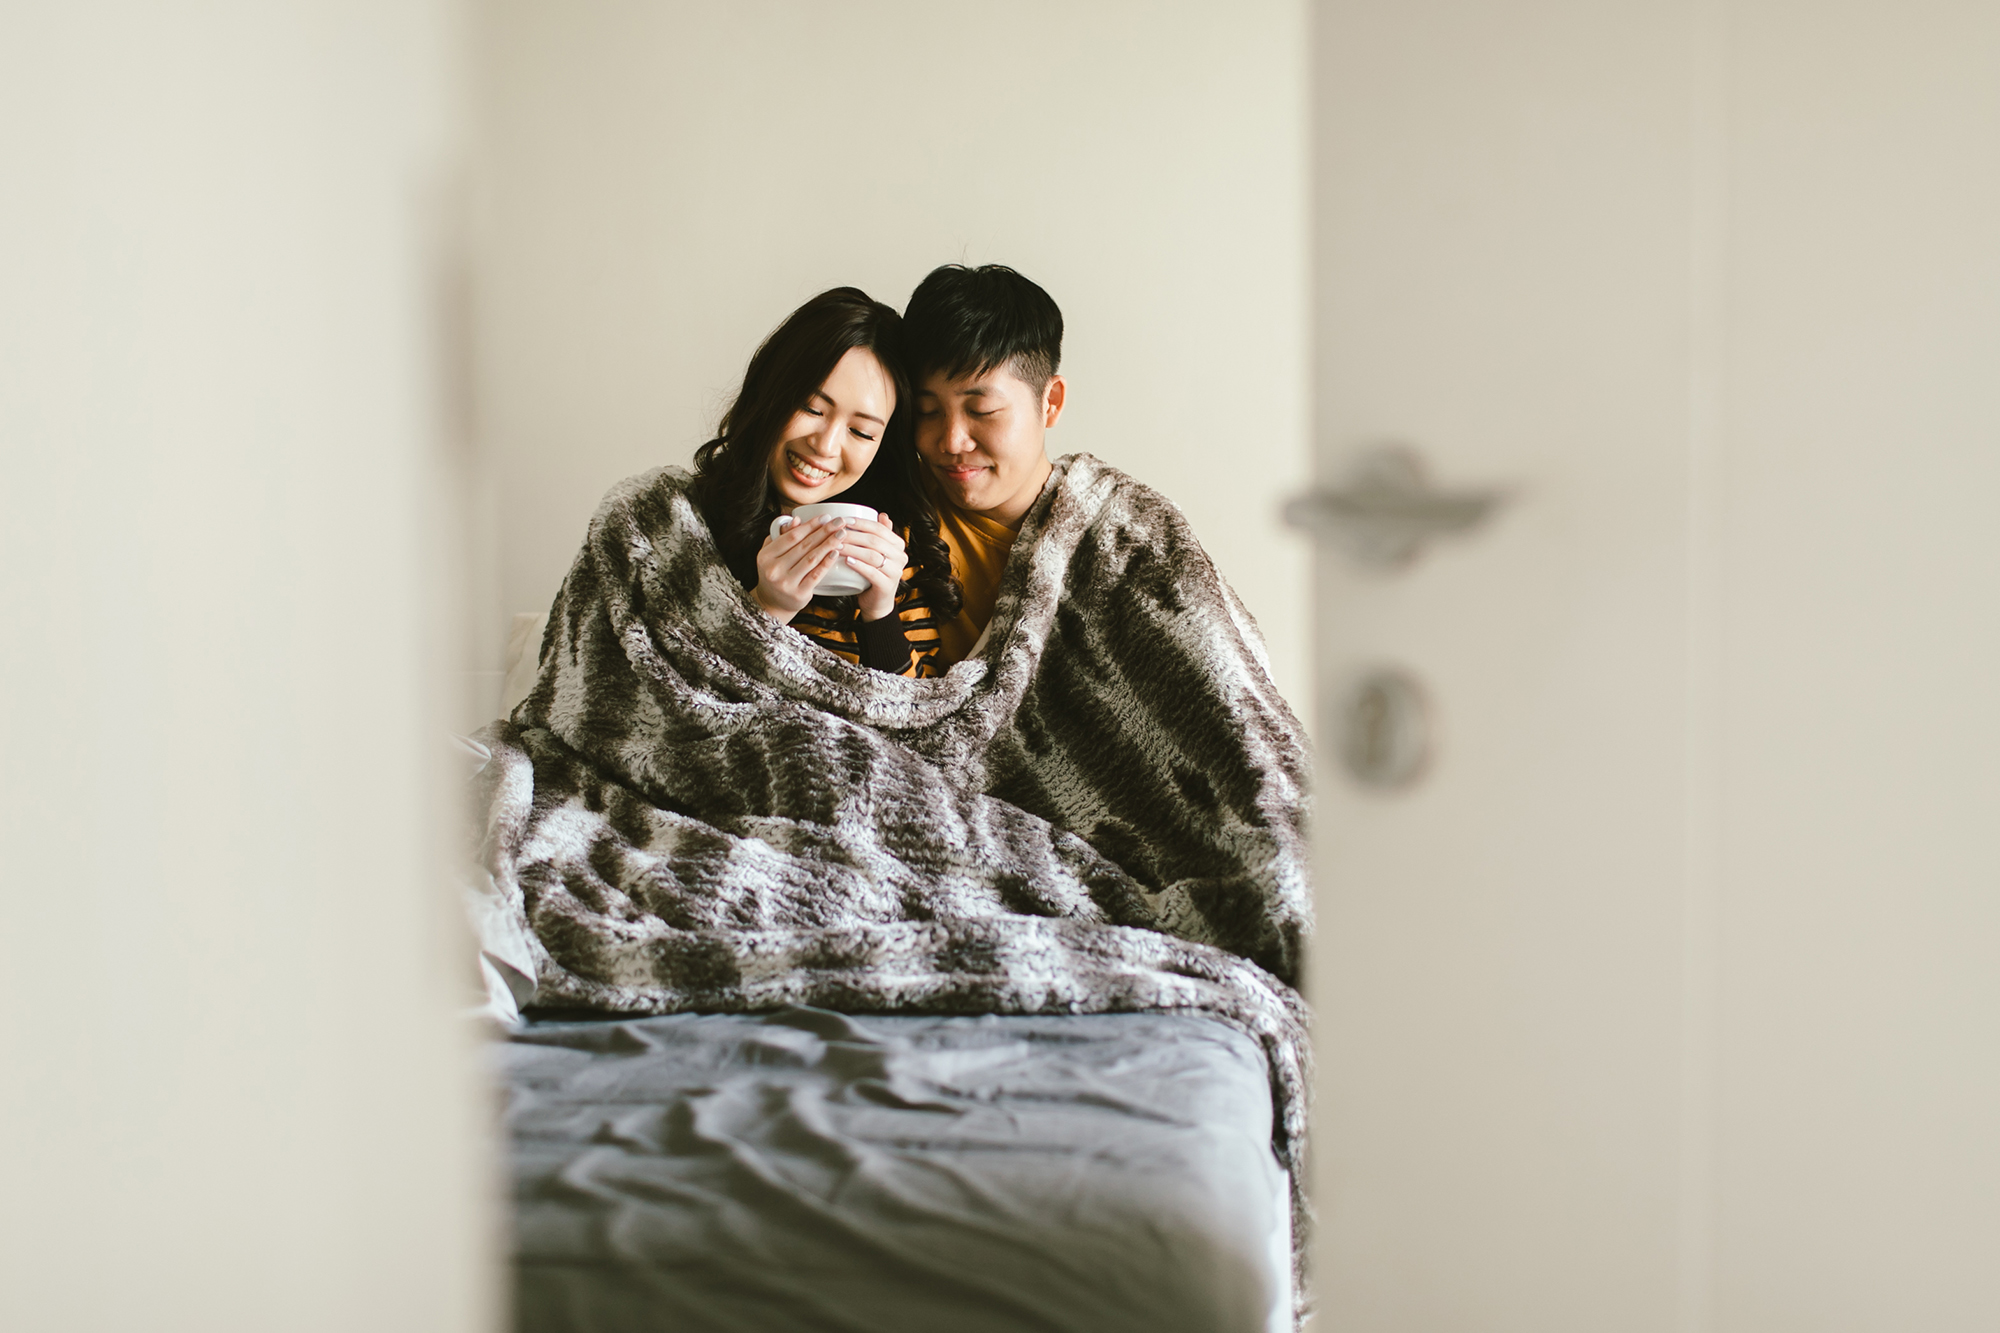 couple_engagement_photographer_photoshoot_cozy.jpg